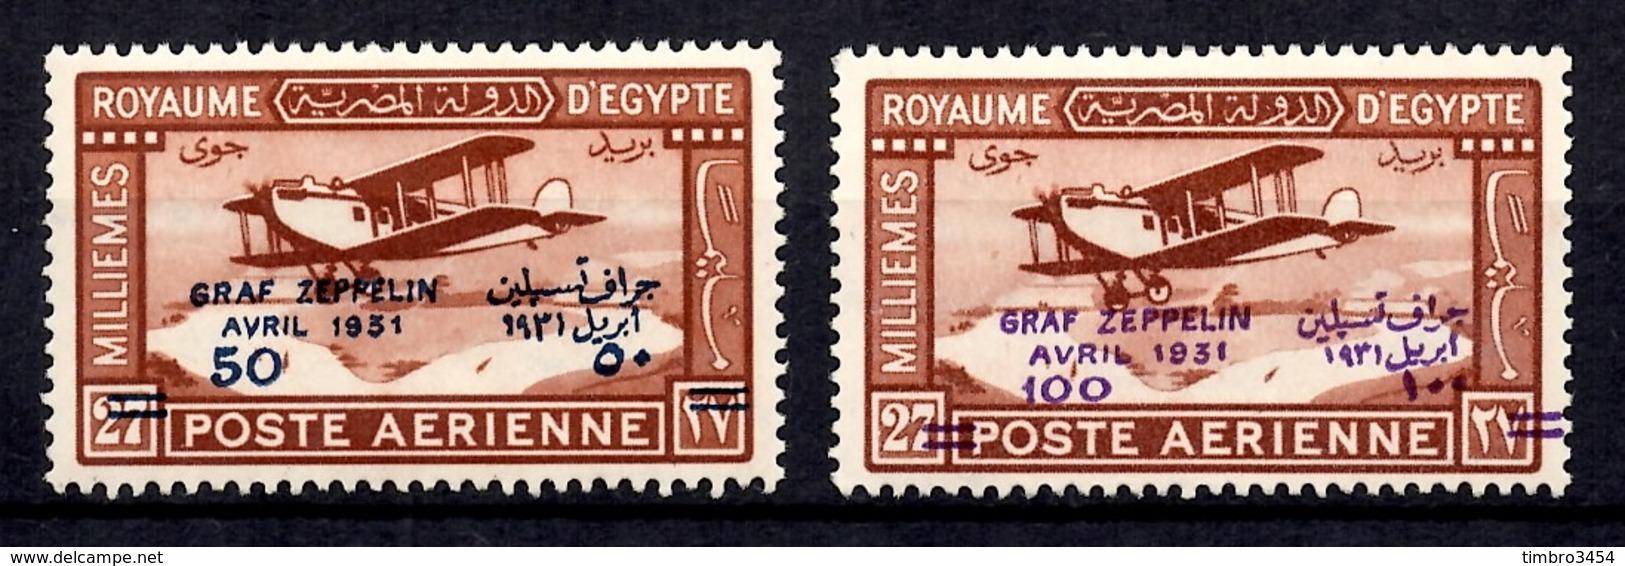 Egypte Poste Aérienne YT N° 3 Et 4 Neufs *. B/TB. A Saisir! - Luchtpost